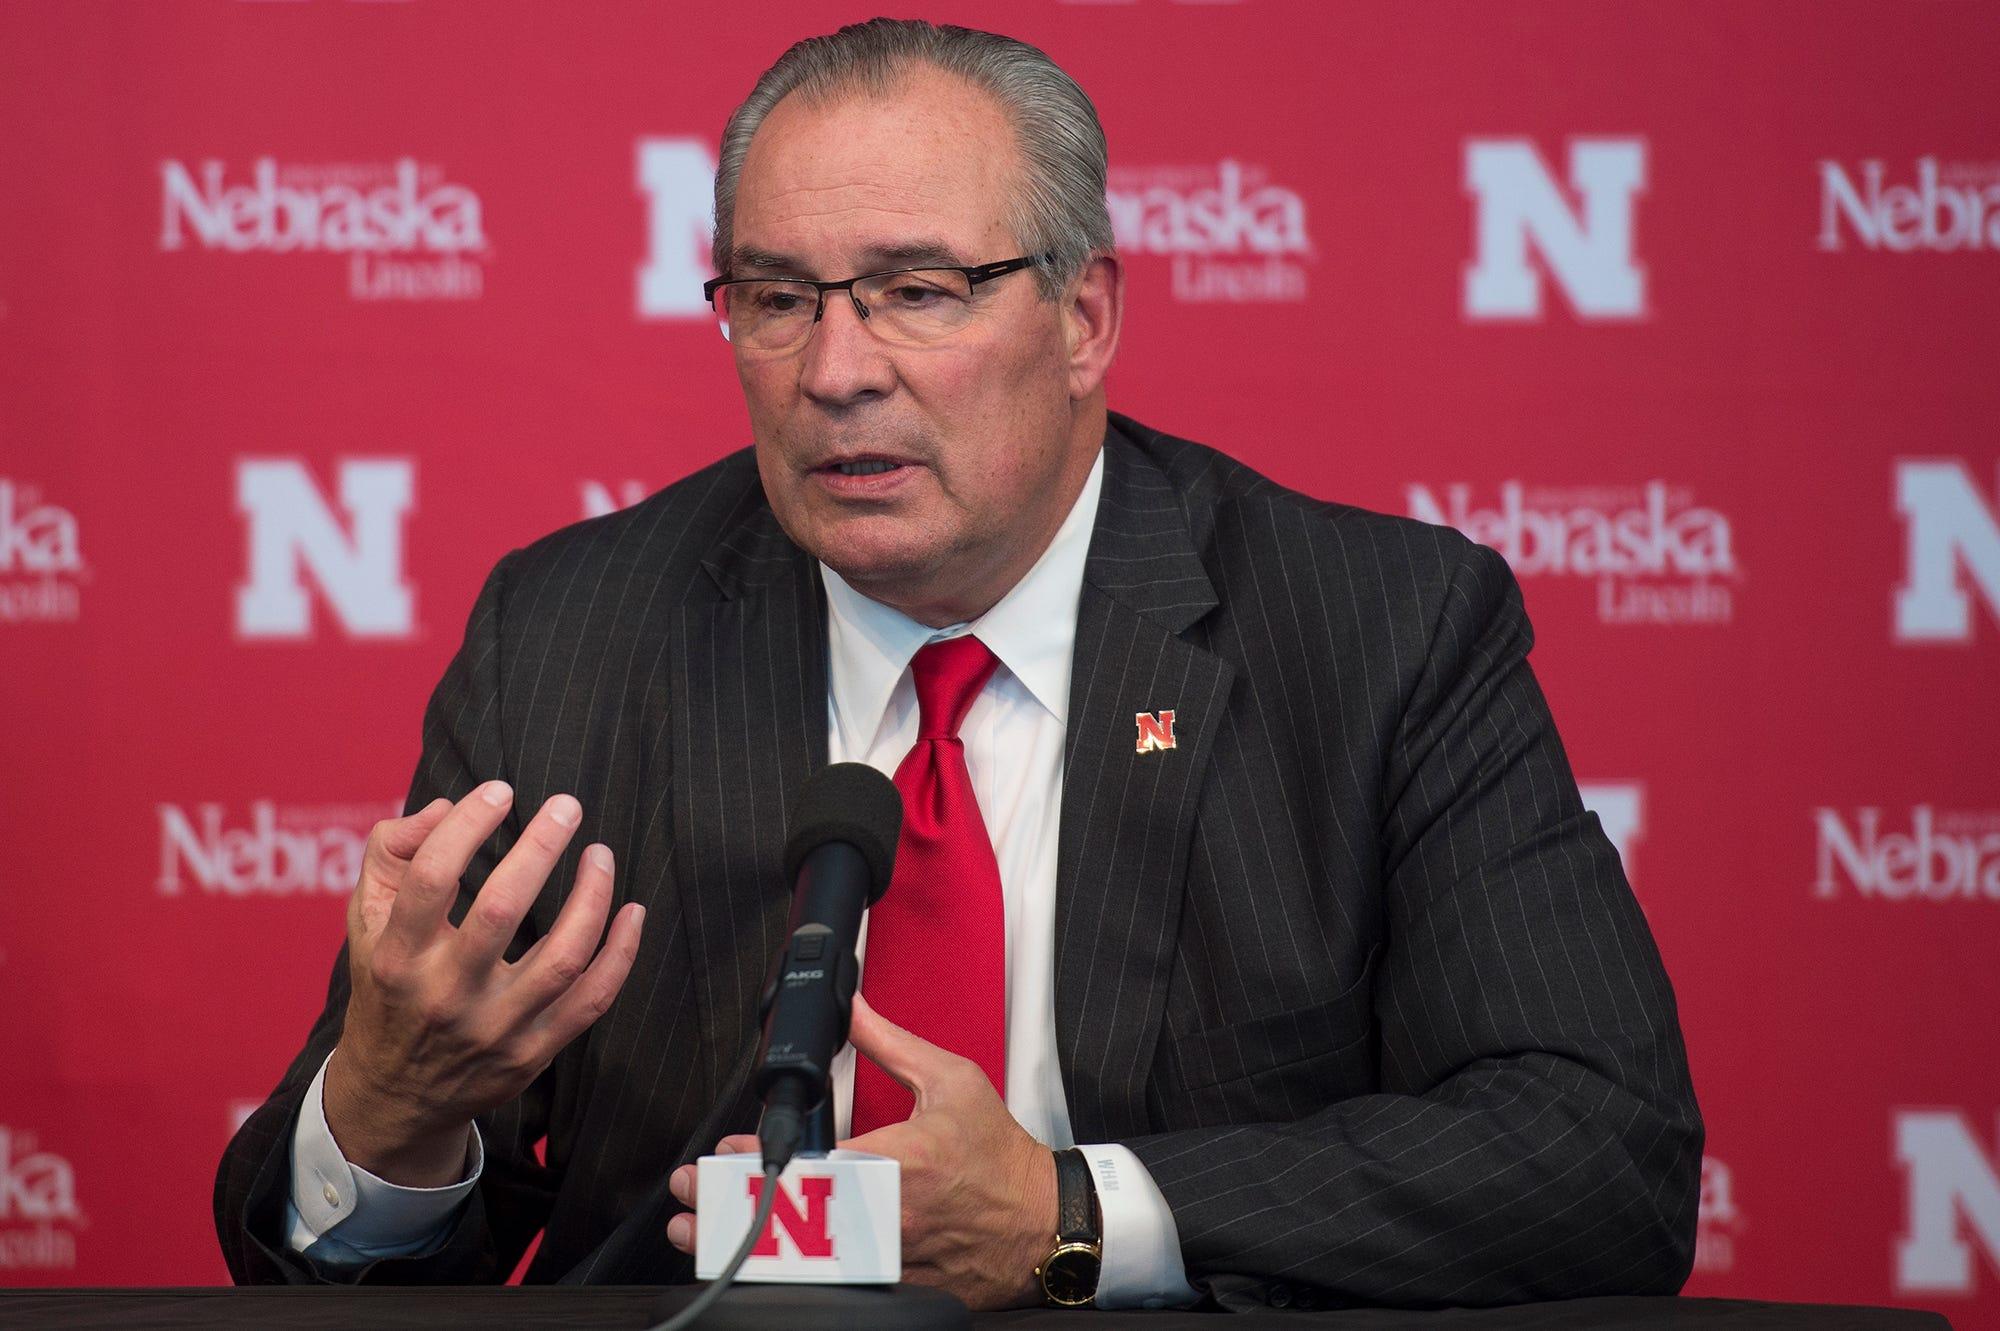 Nebraska picks Washington State AD to head athletics program